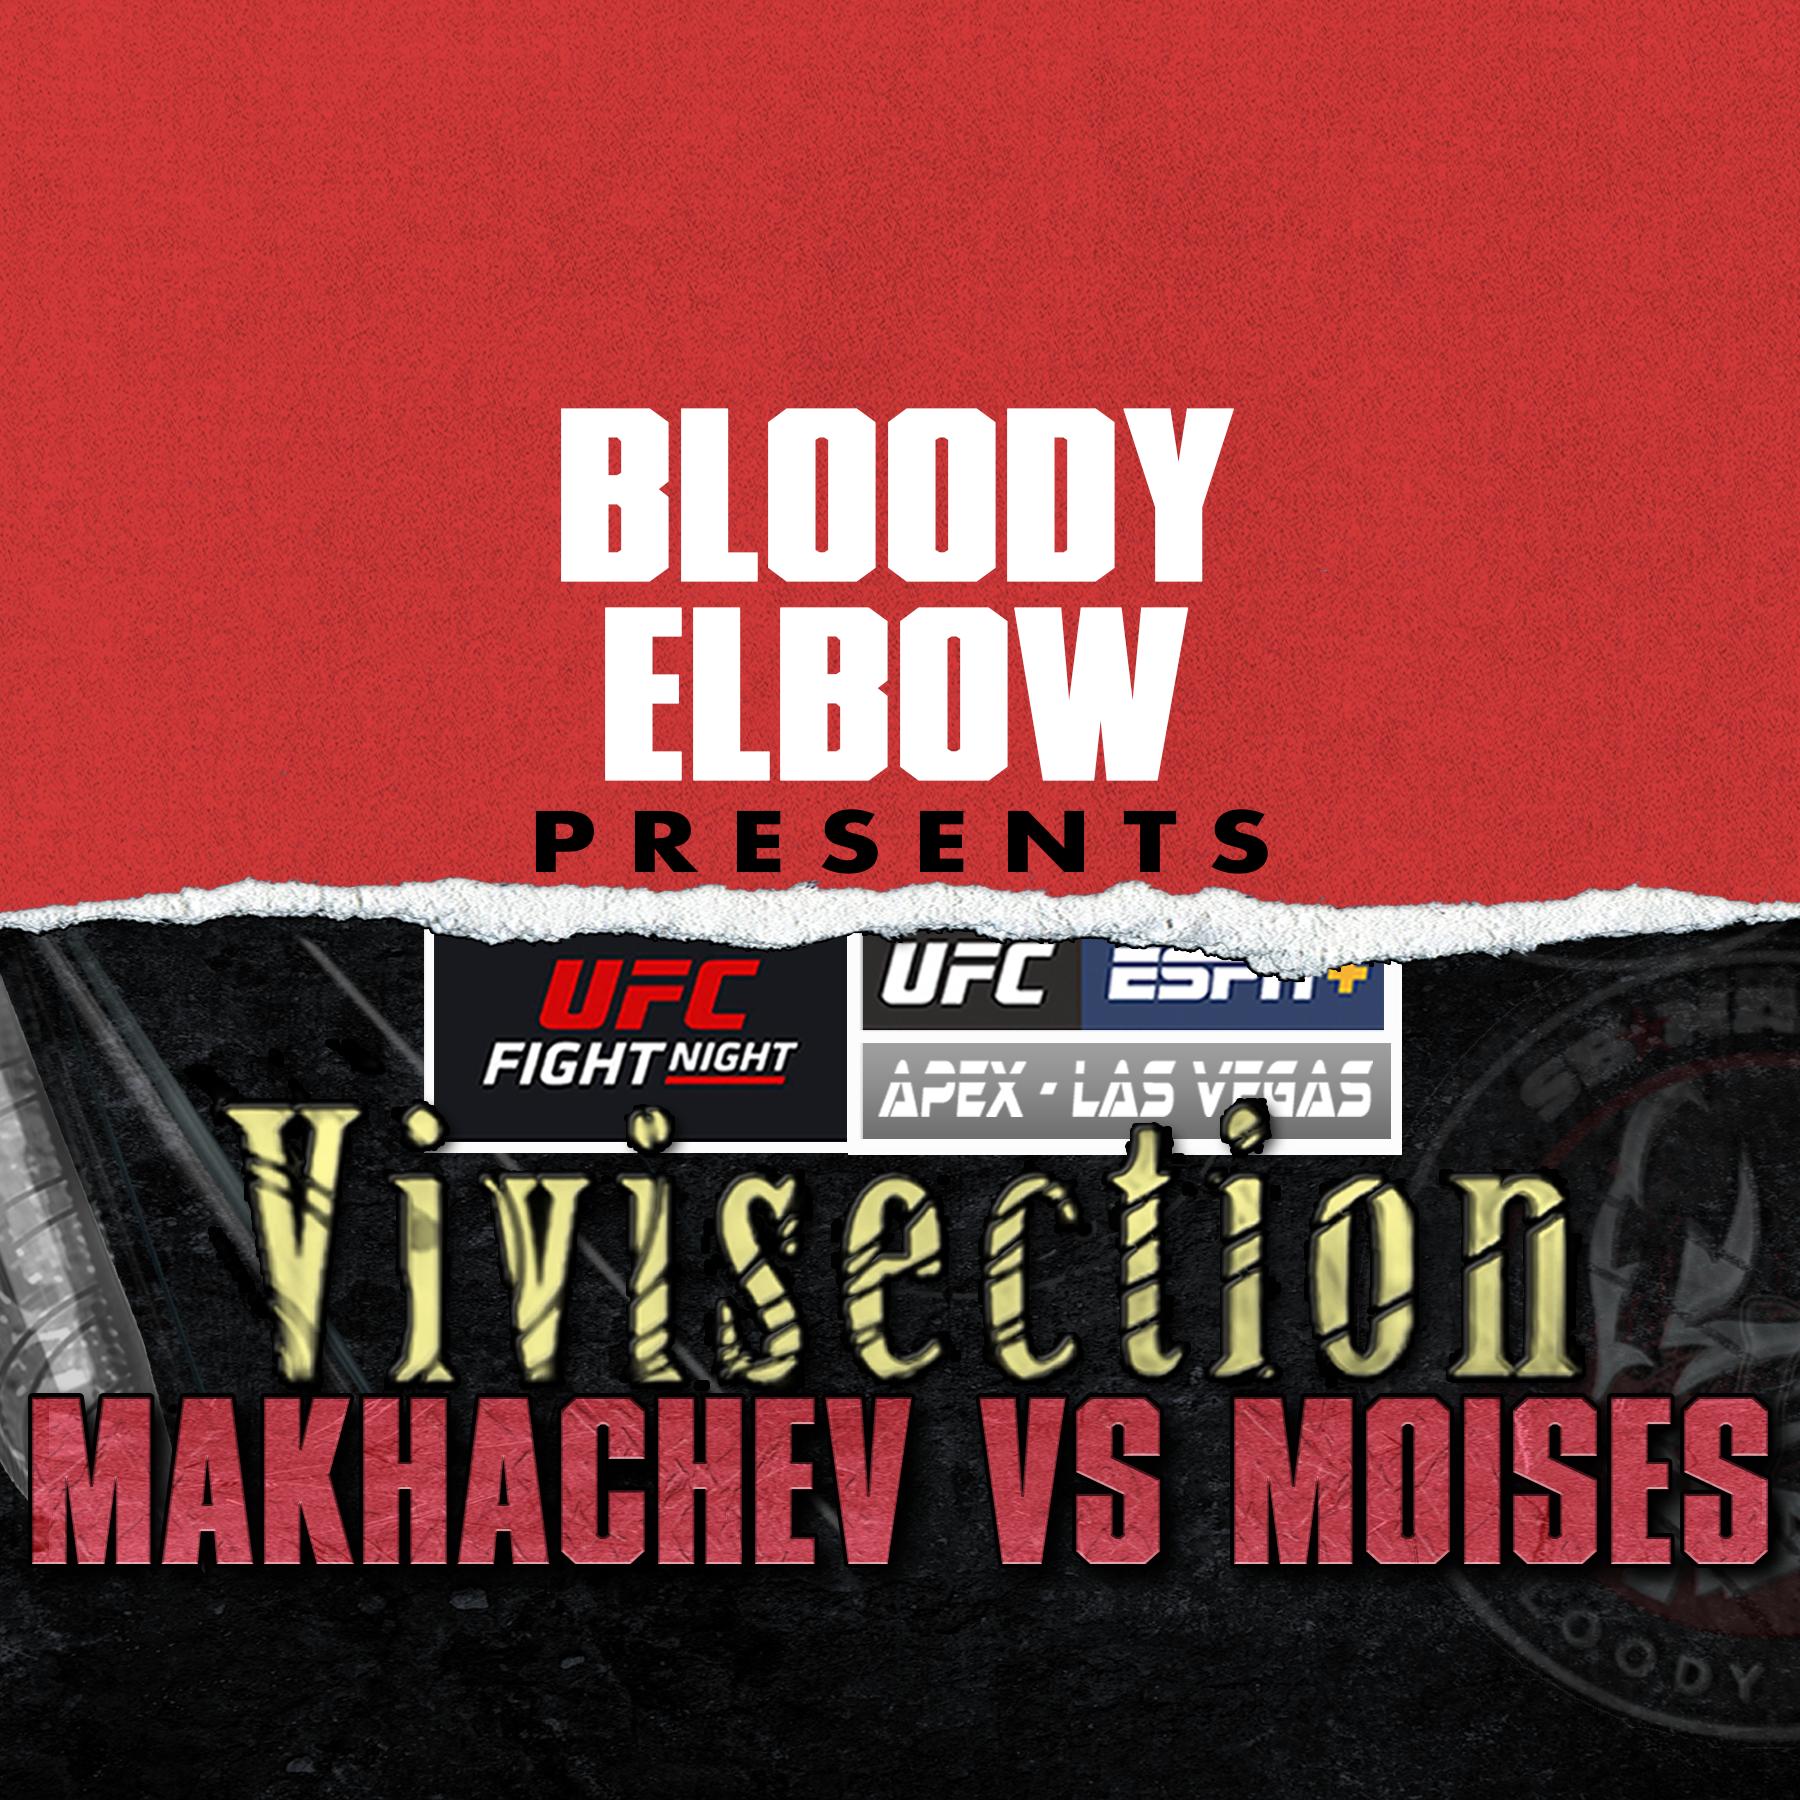 MMA VIVI, The MMA Vivisection, UFC Podcast, MMA Podcast, UFC Vegas 31, Makhachev vs Moises, UFC Picks & Predictions, UFC Analysis, UFC Odds, UFC Vegas 31 Preview, UFC Main Card, UFC Prelims,